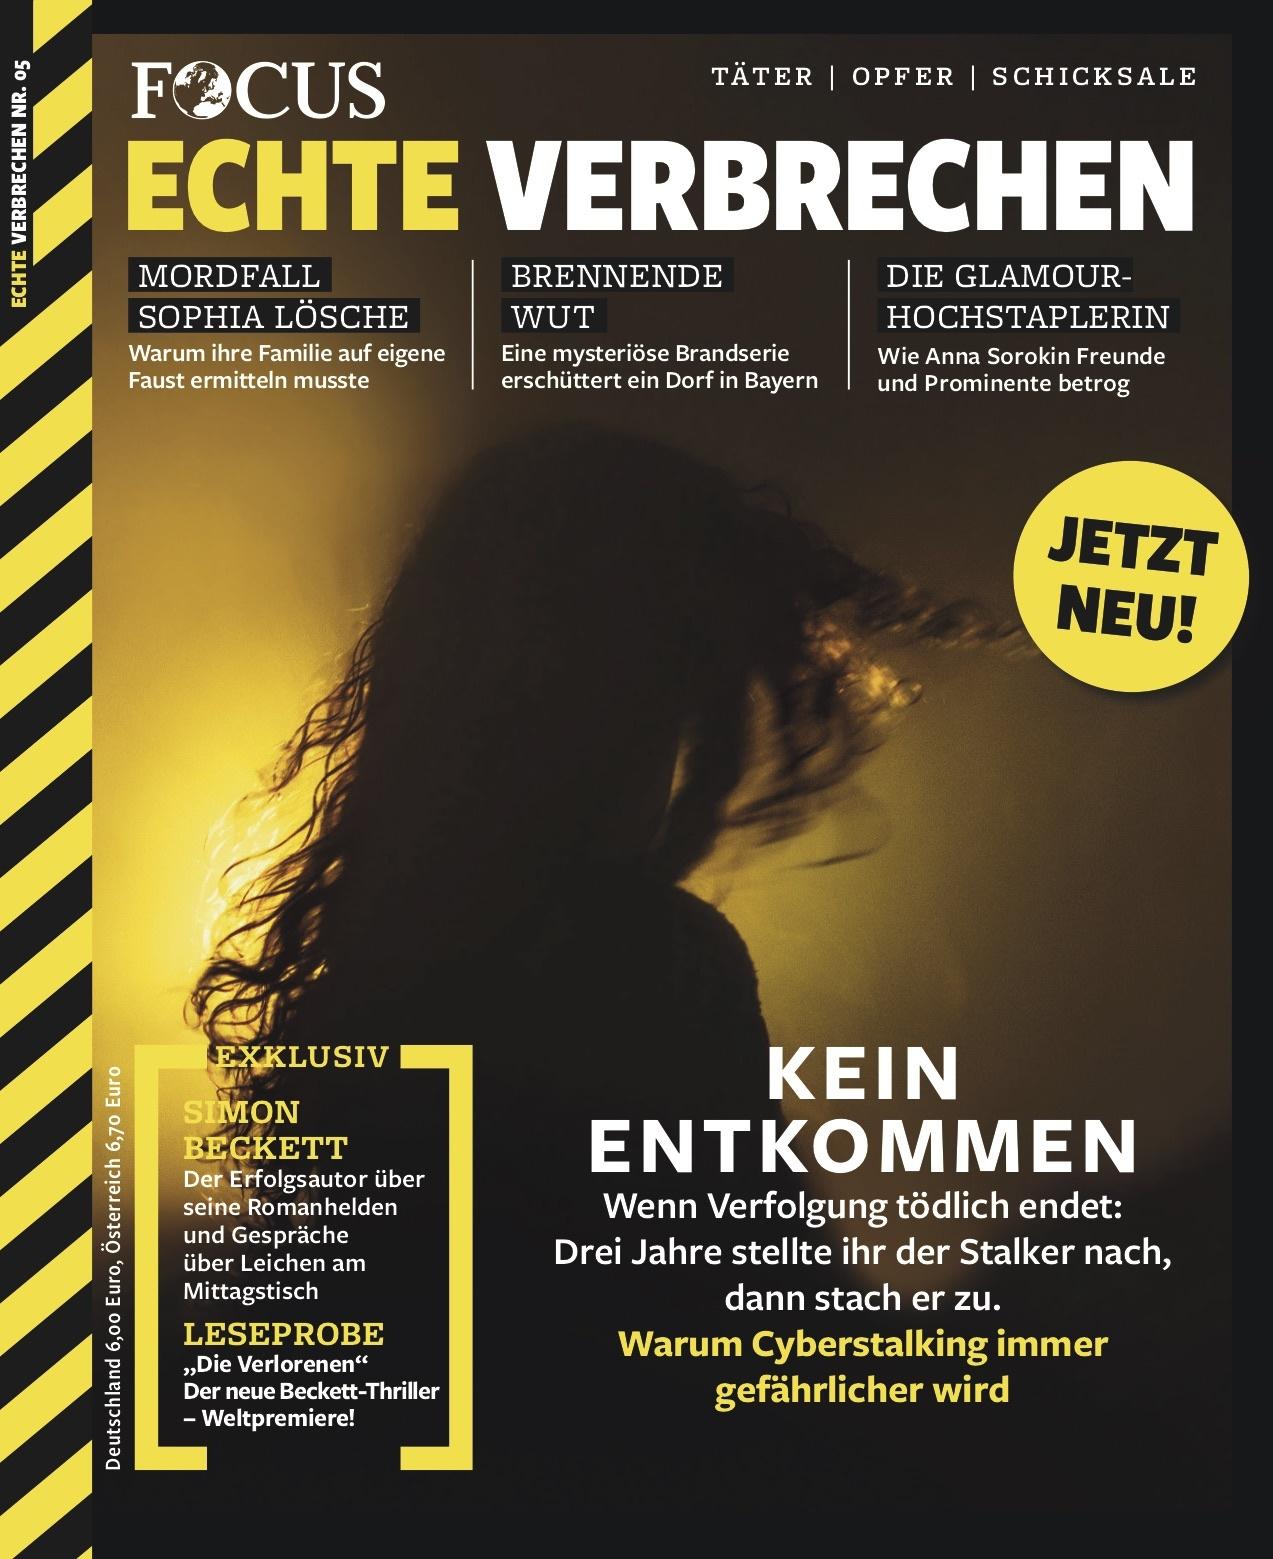 FOCUS Echte Verbrechen FOCUS Echte Verbrechen Nr. 05/2021